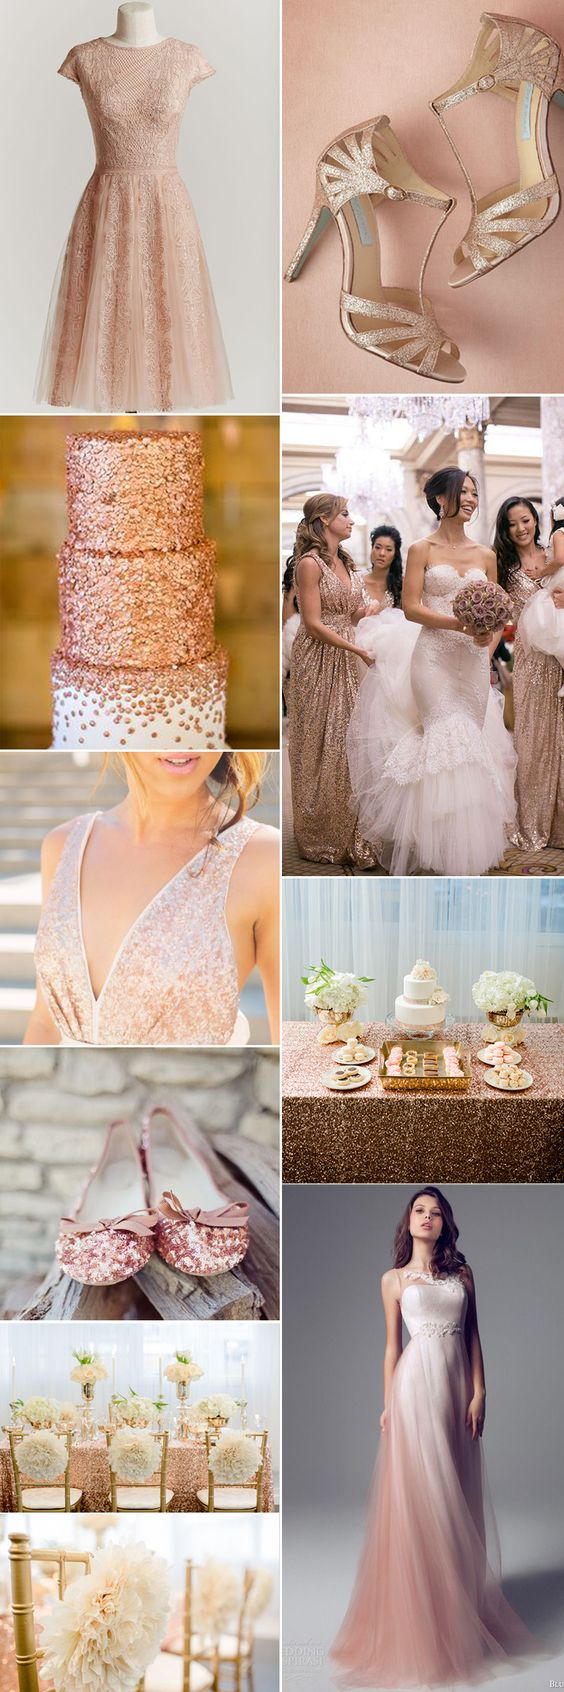 Metallic rose gold creates the most romantic wedding day theme - GS Inspiration on Glitzy Secrets